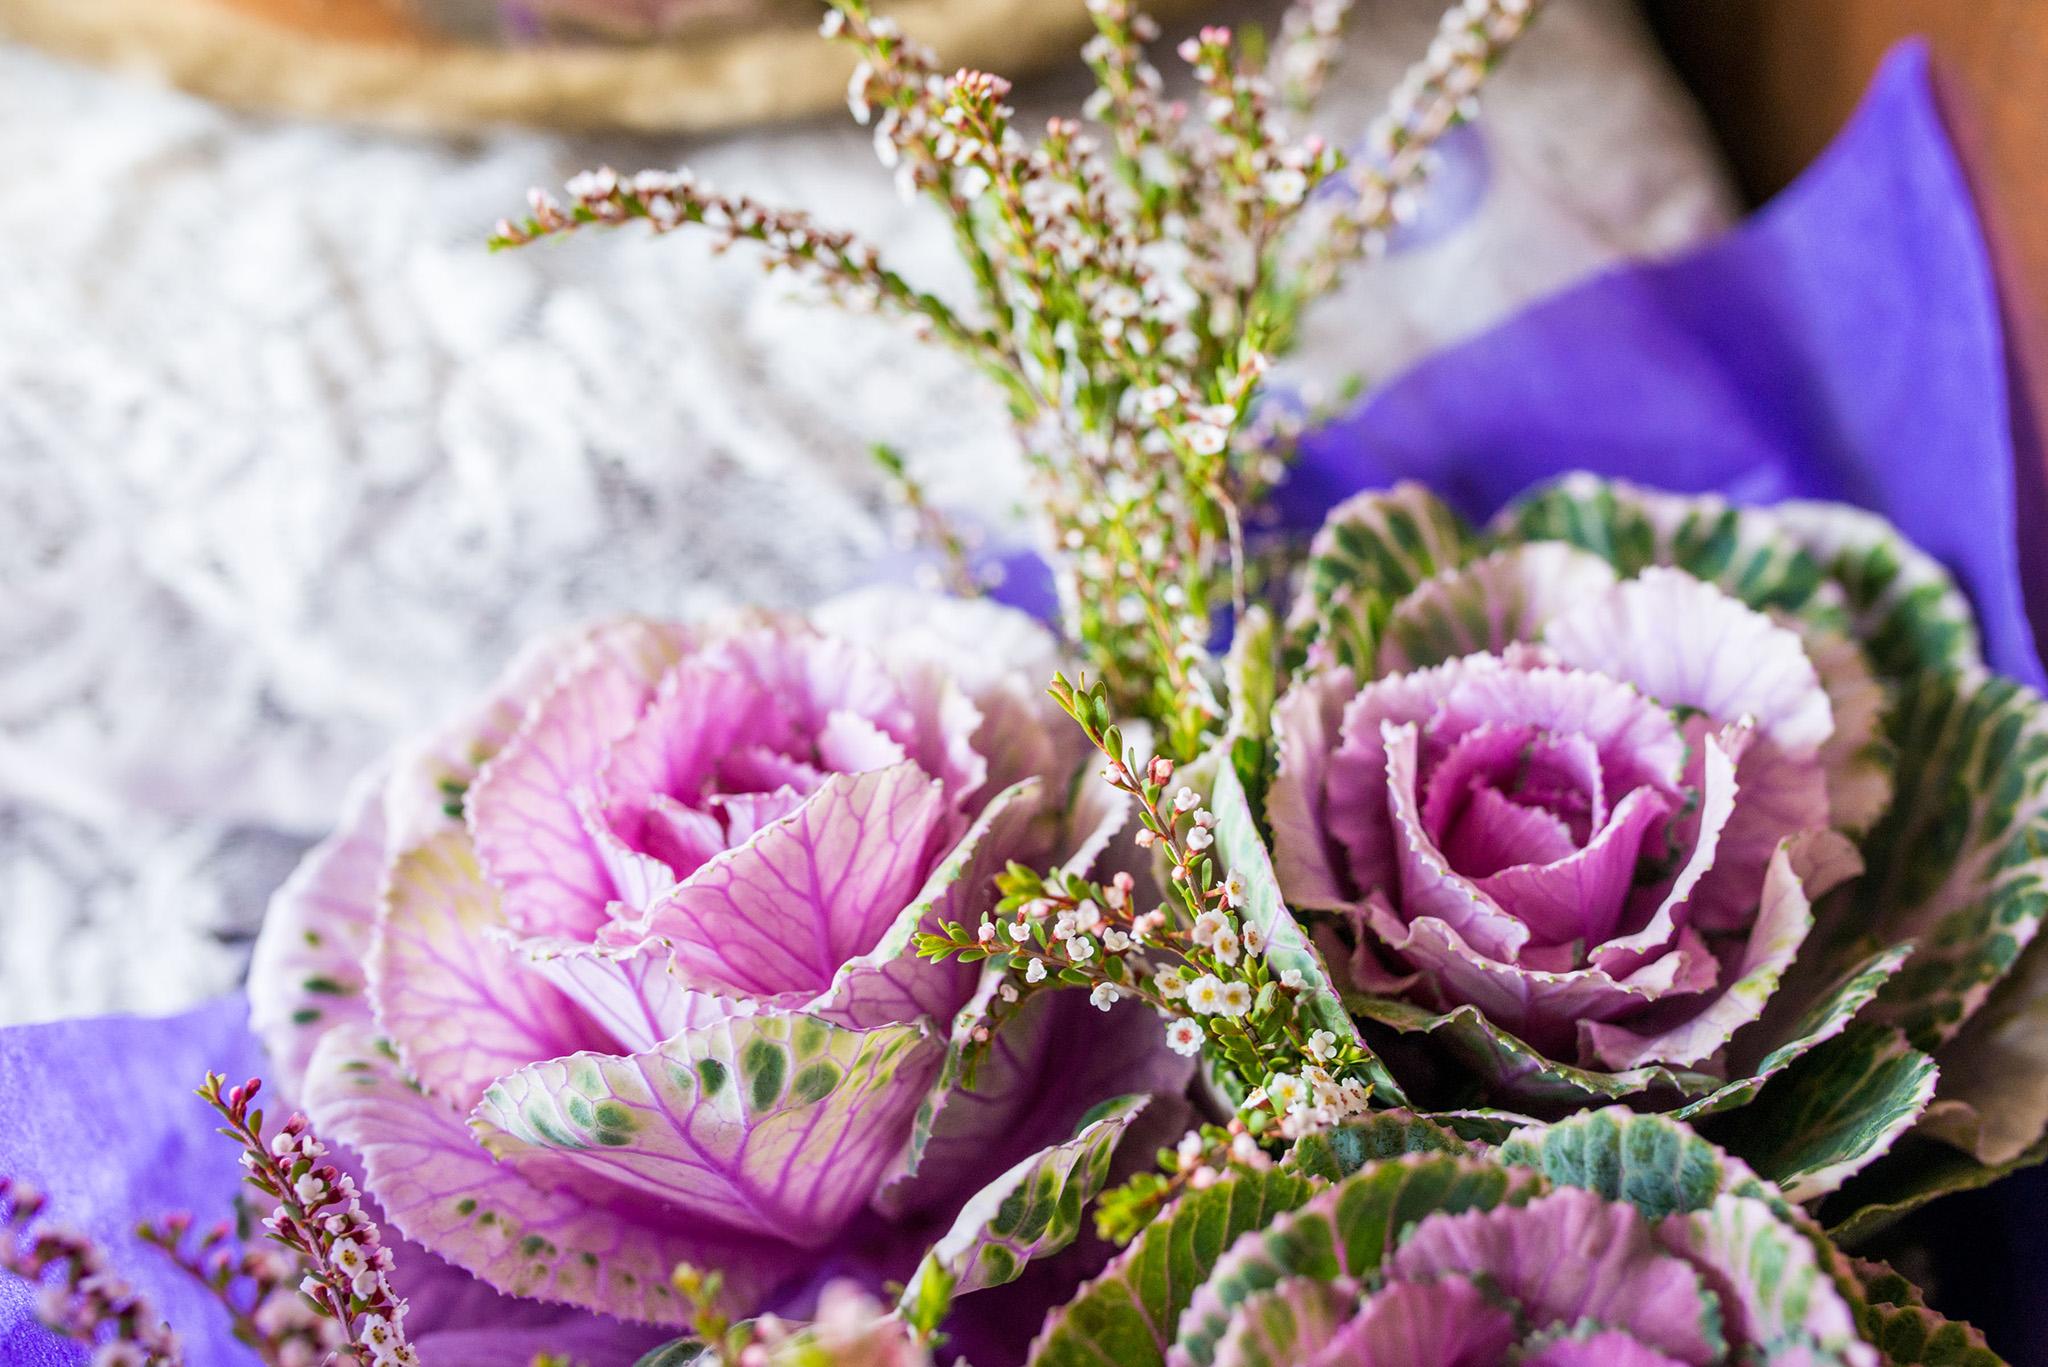 ingleside flowers1.jpg